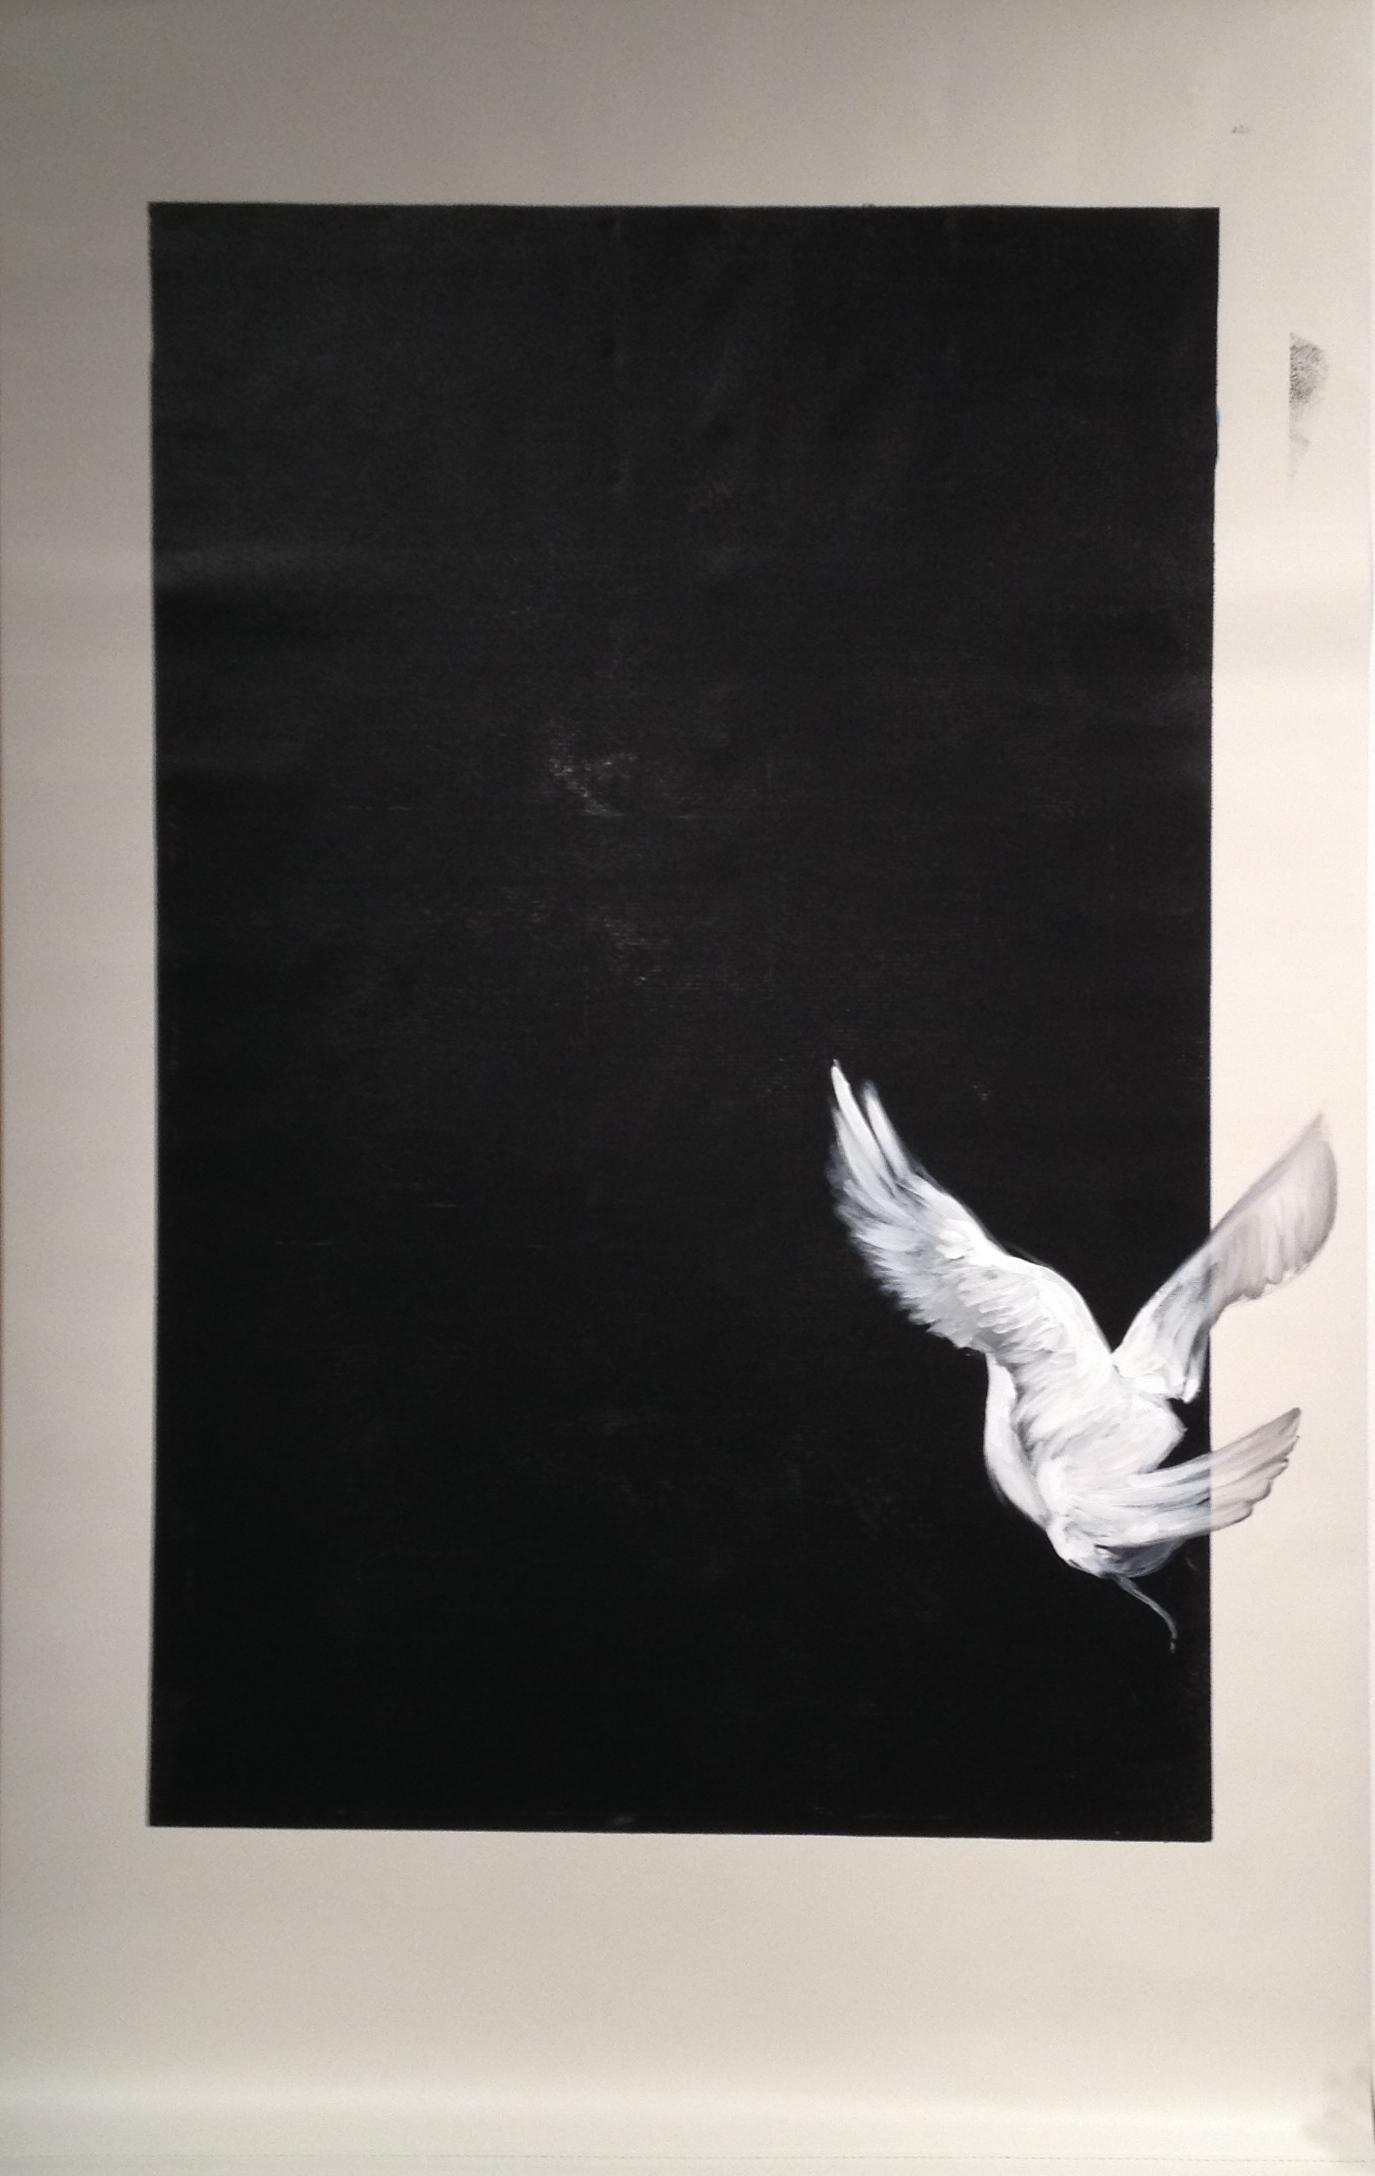 Leah's Heron